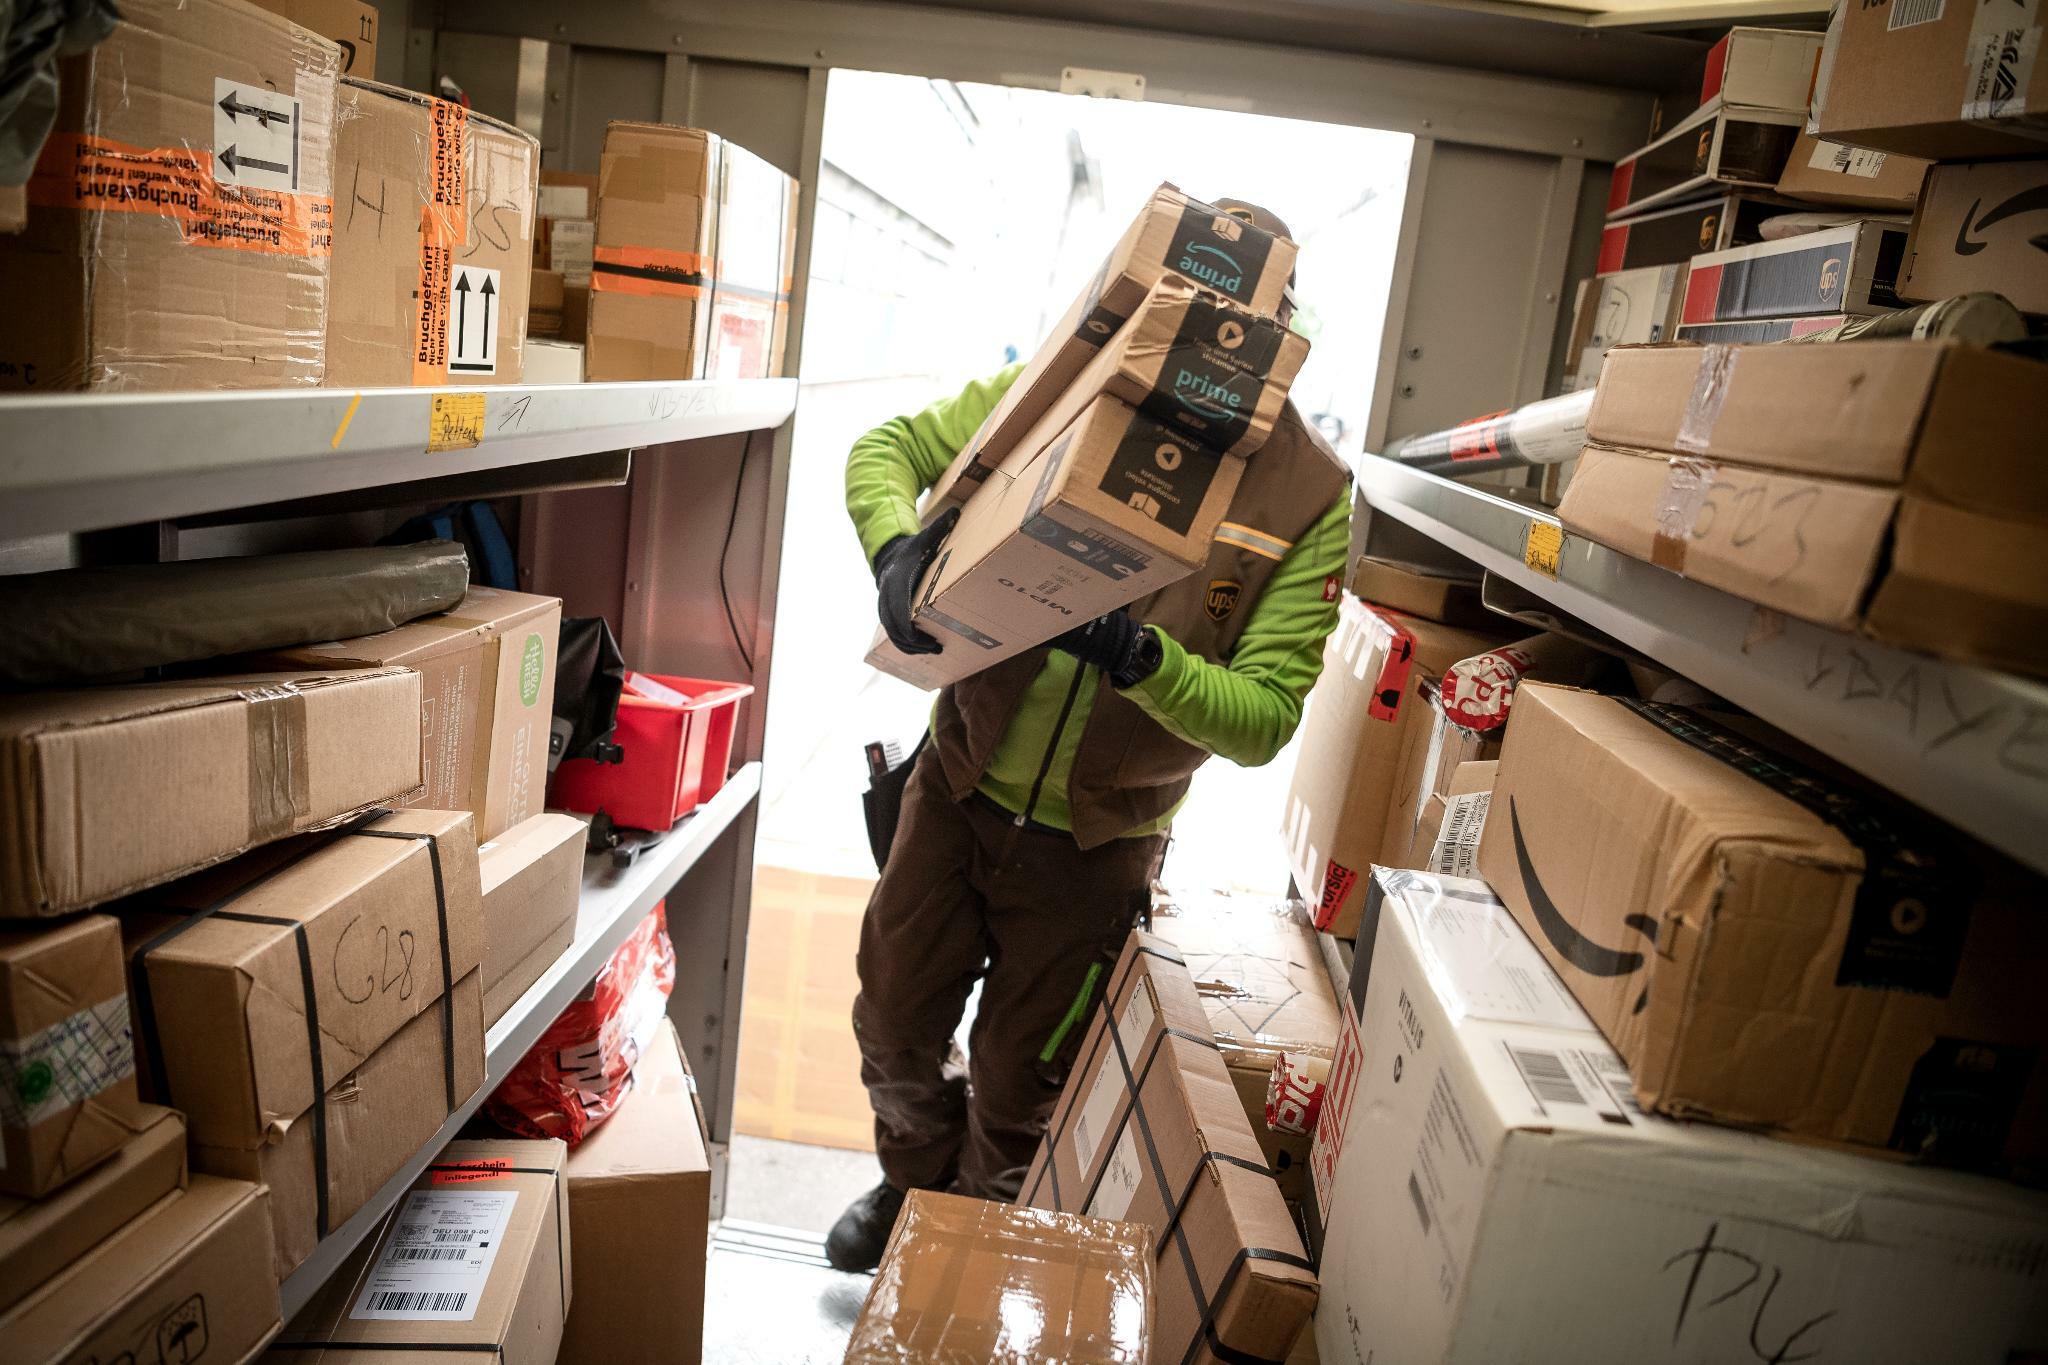 Paketbranche feilt an ihrer Zustellprognose